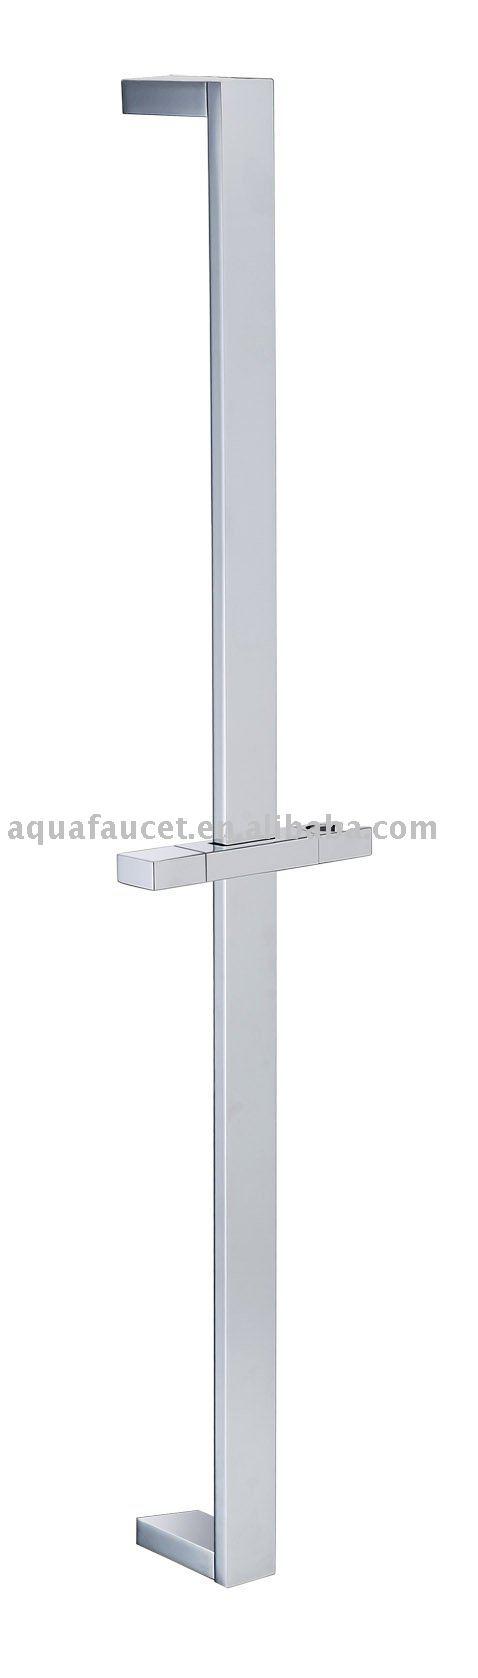 Shower Slide Rail images